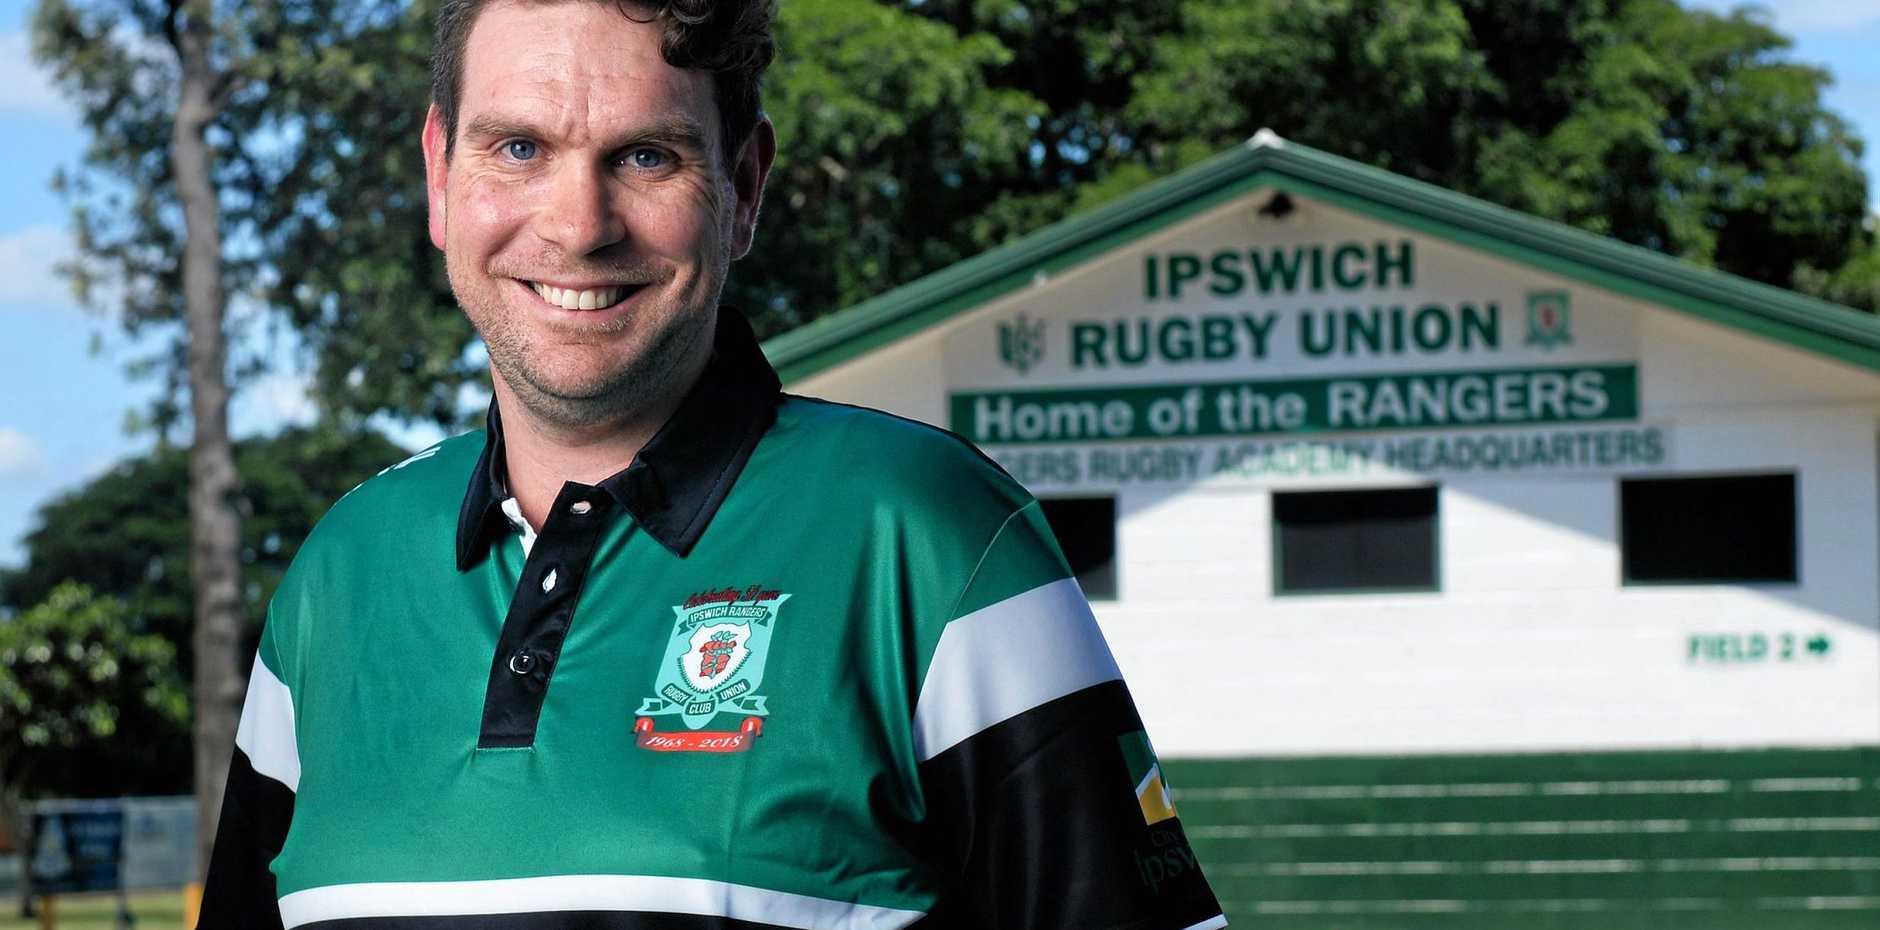 Ipswich Rangers life member Nicholas Pender.